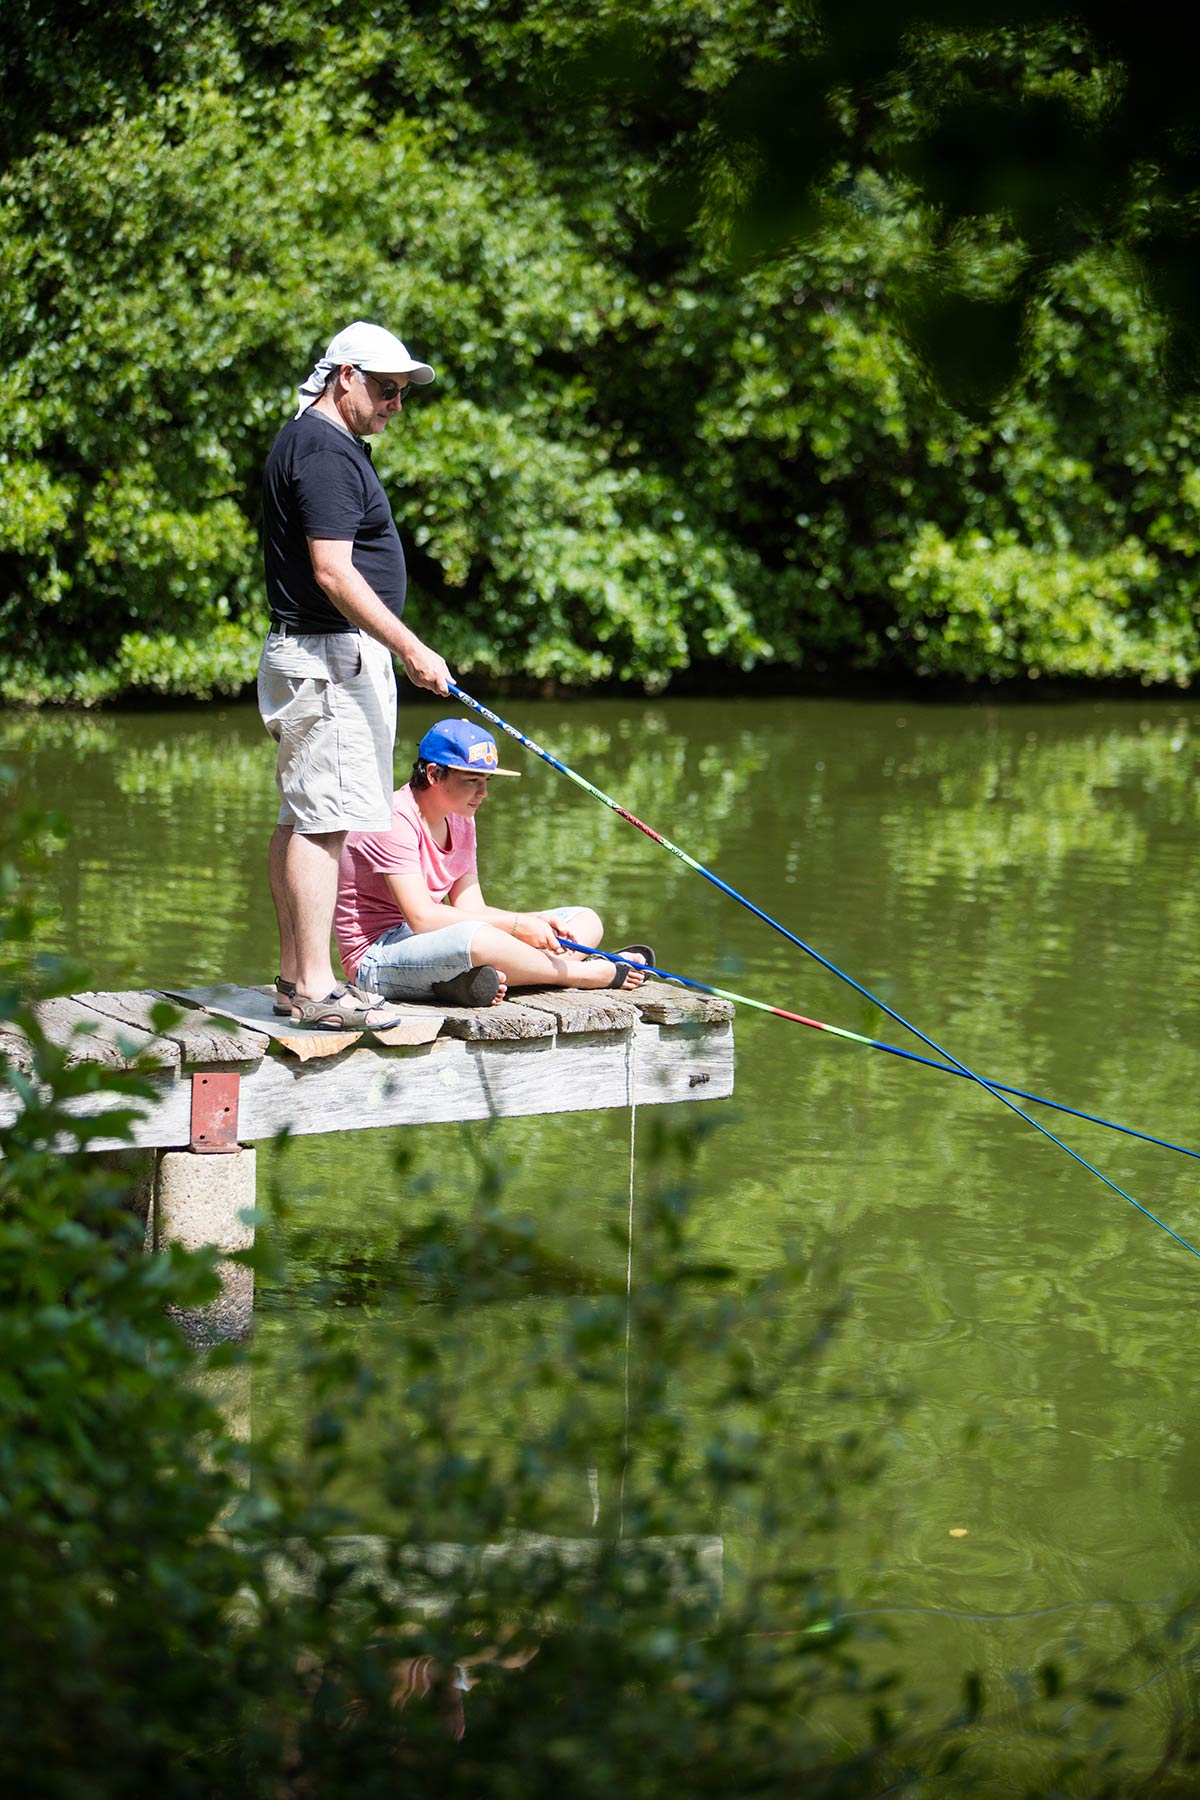 pêche étang camping Castel 5 étoiles en Vendée